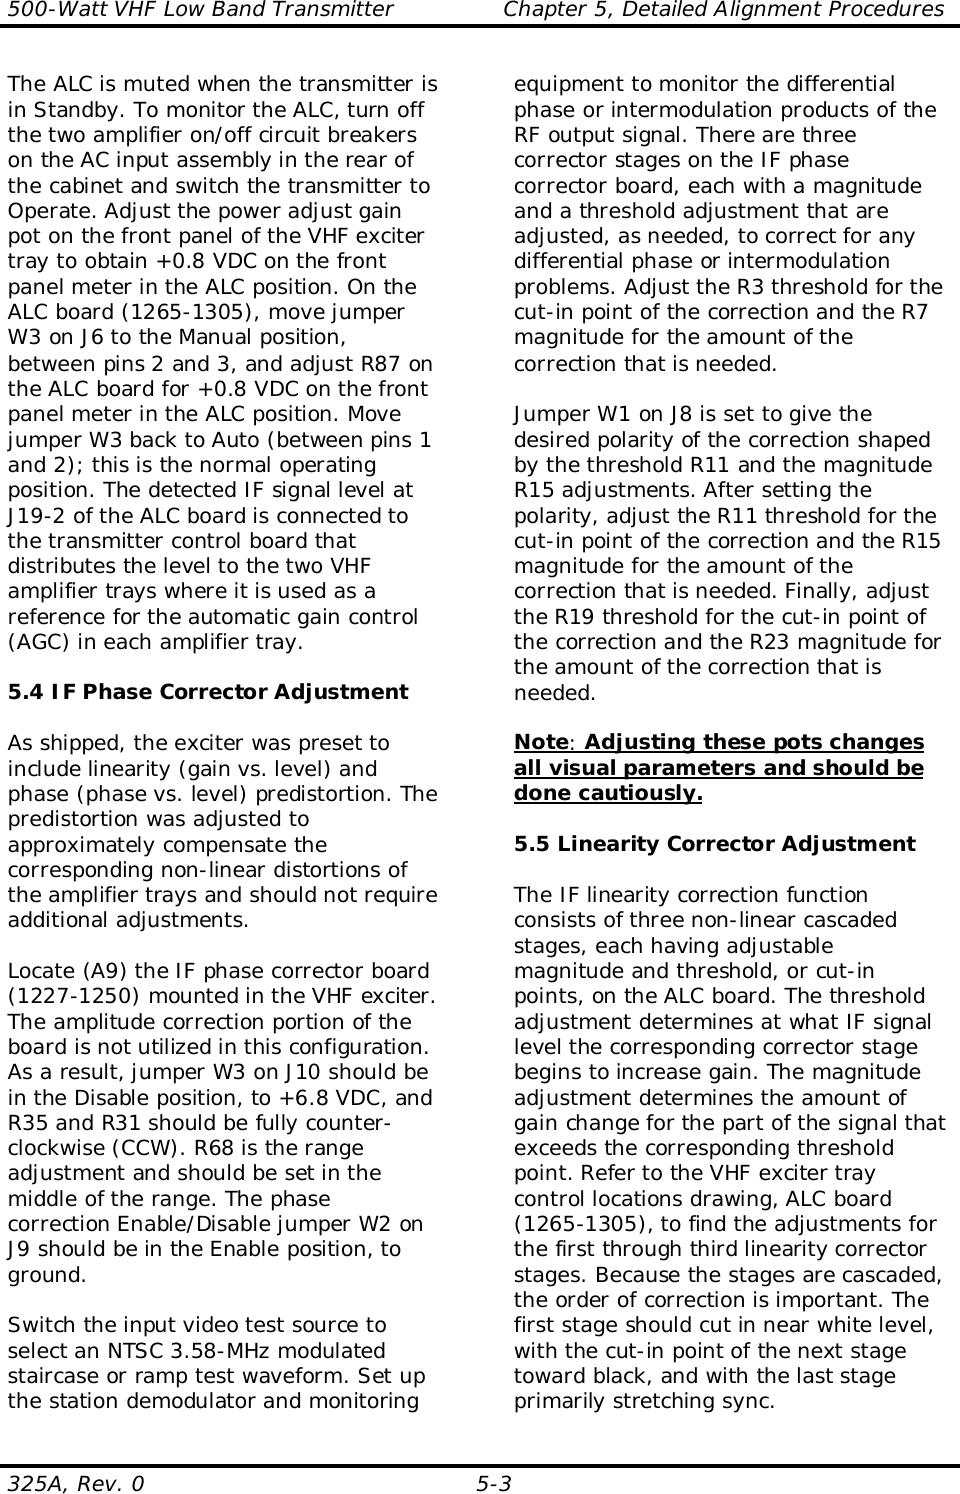 UBS Axcera 325A 500-Watt VHF Low-band Television Transmitter